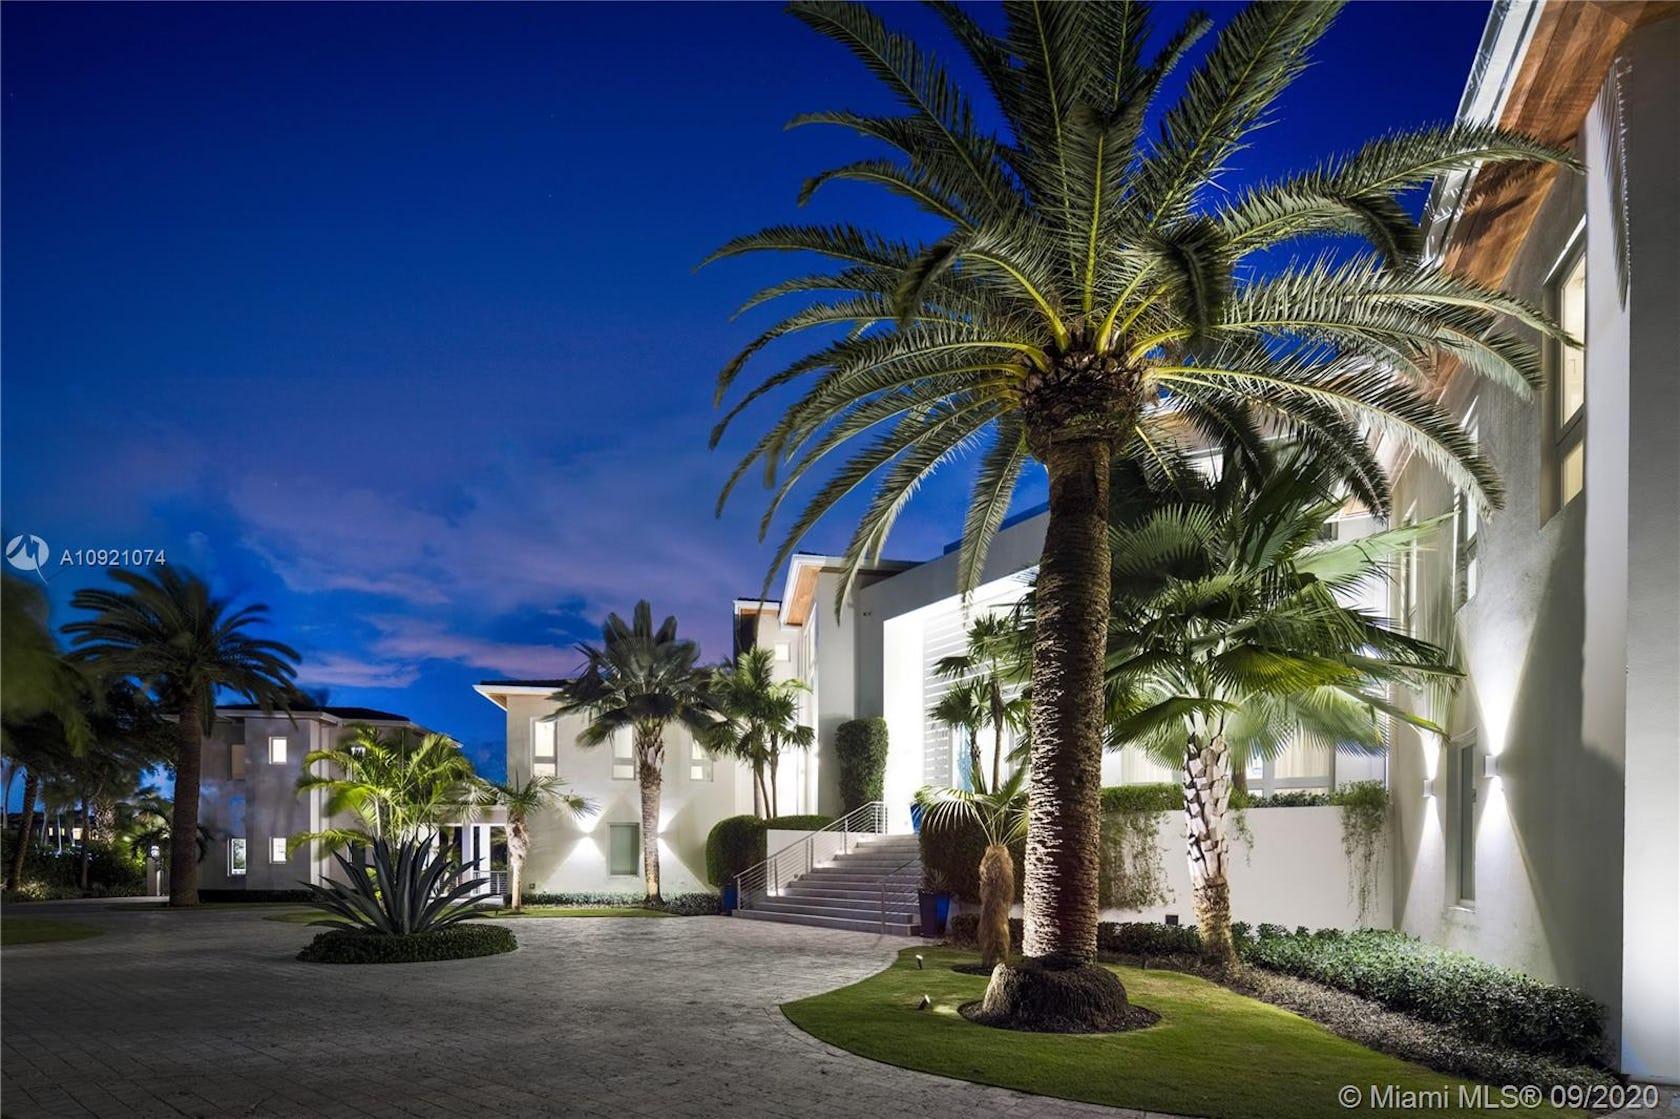 villa housing building house summer palm tree plant arecaceae tree outdoors